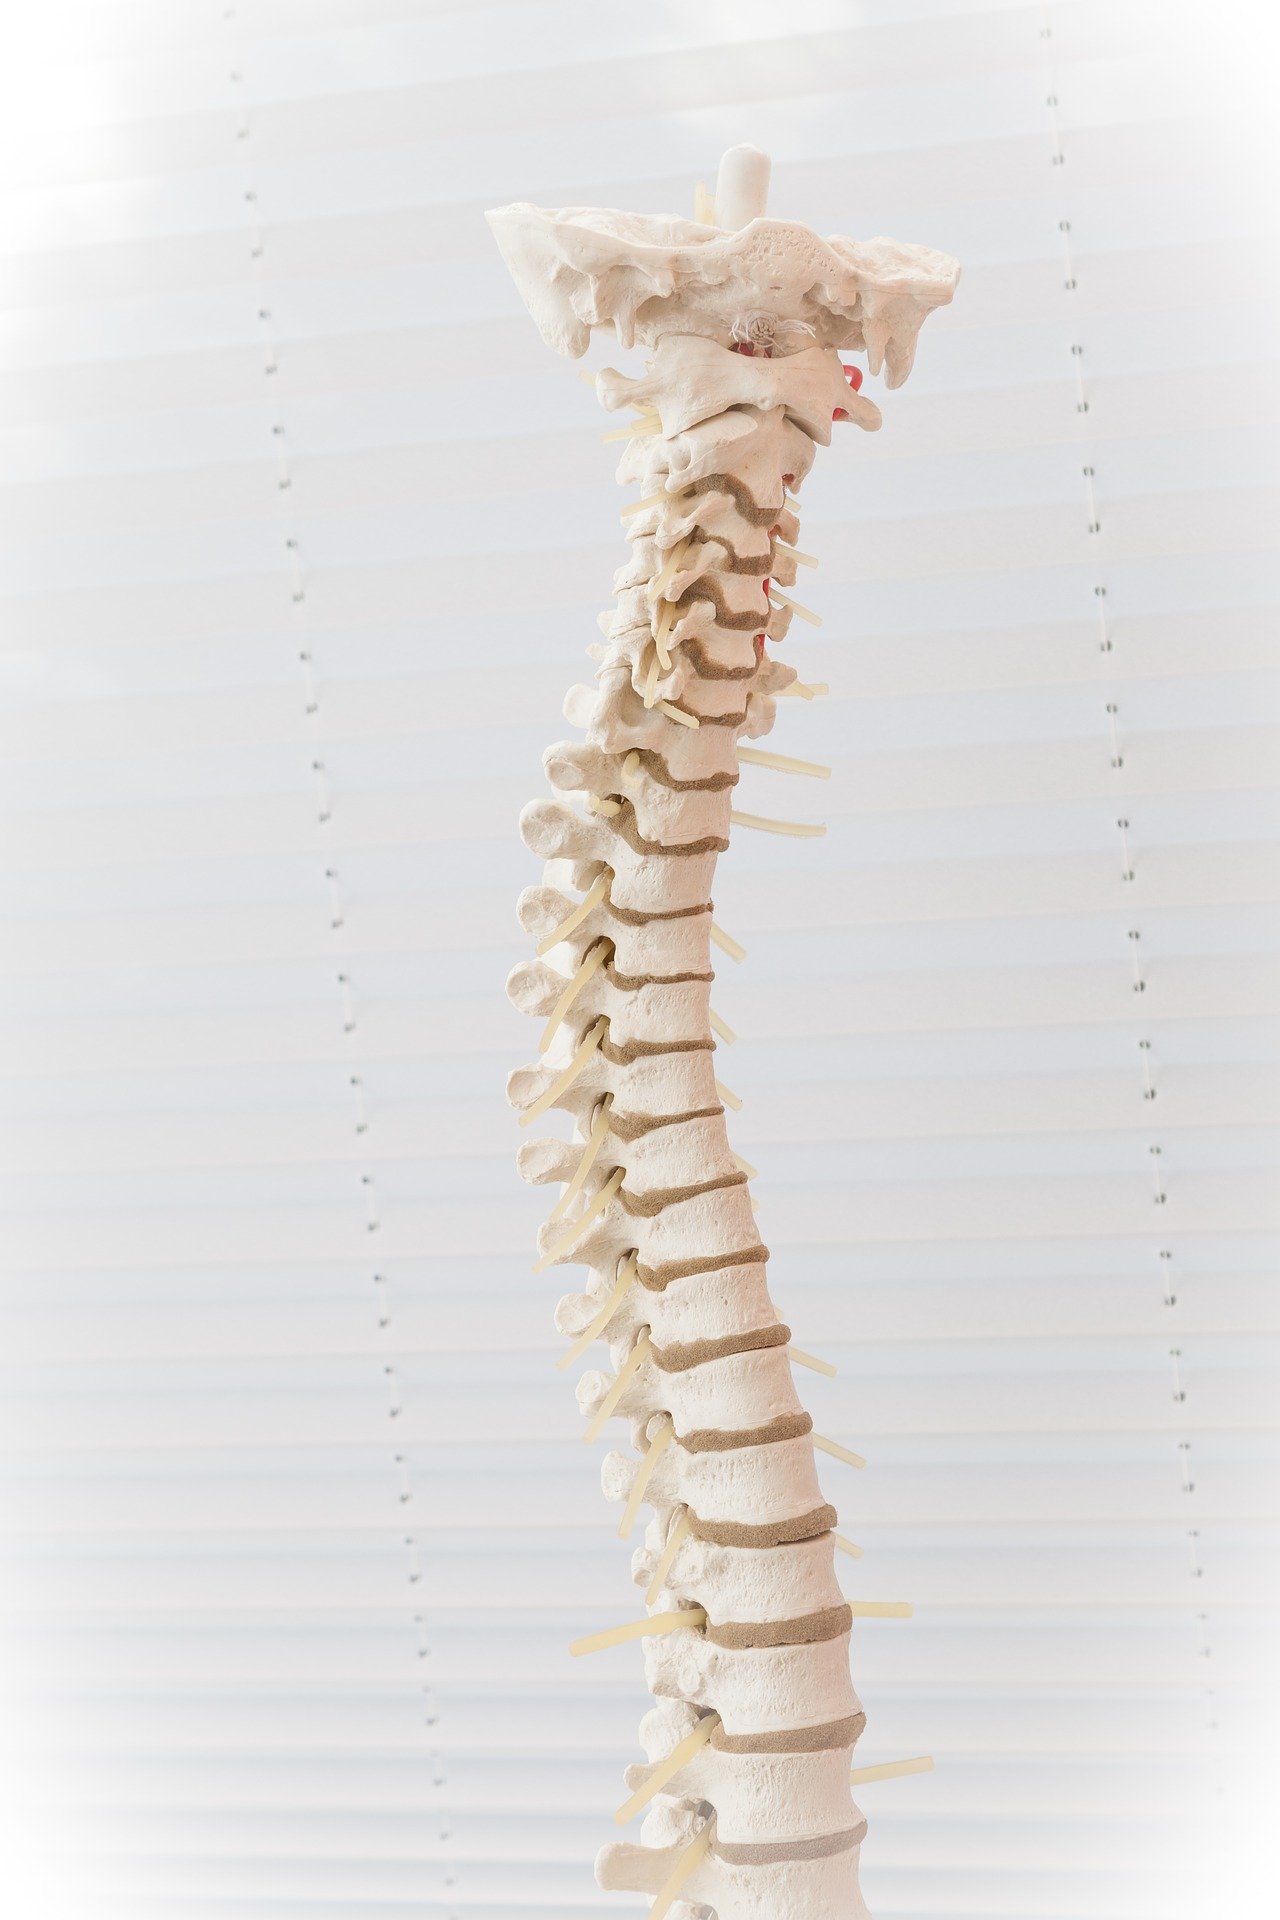 spine-2539697_1920.jpg